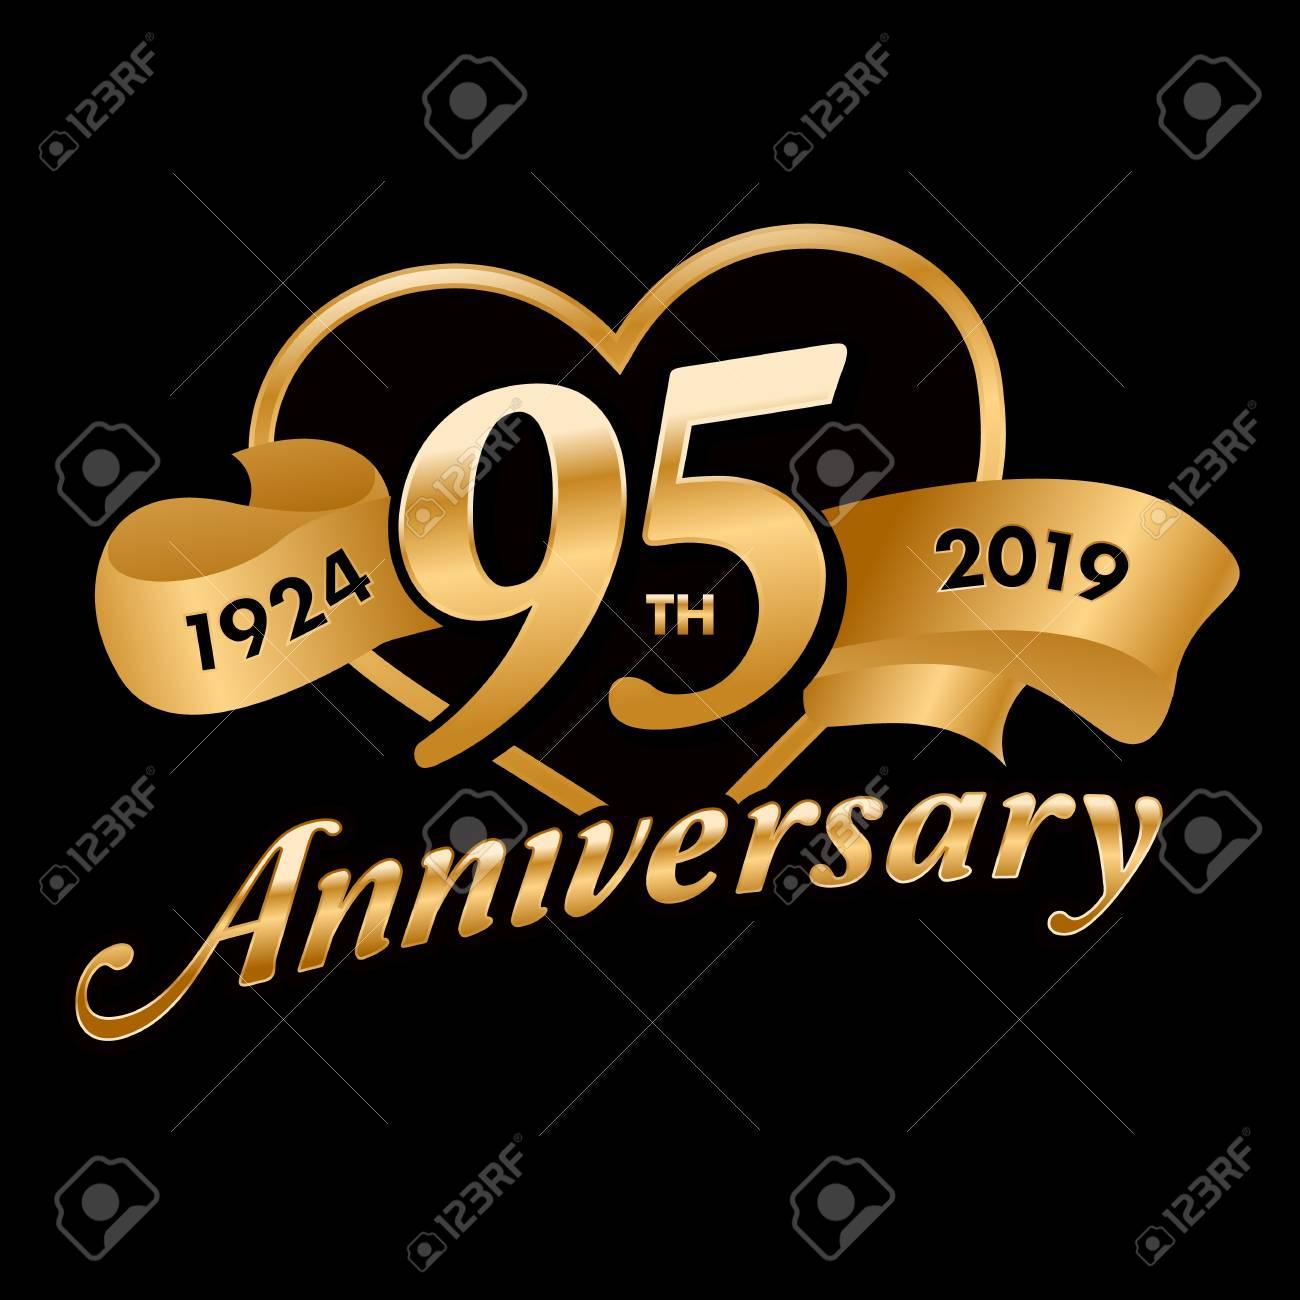 95th Anniversary Symbol - 121759384